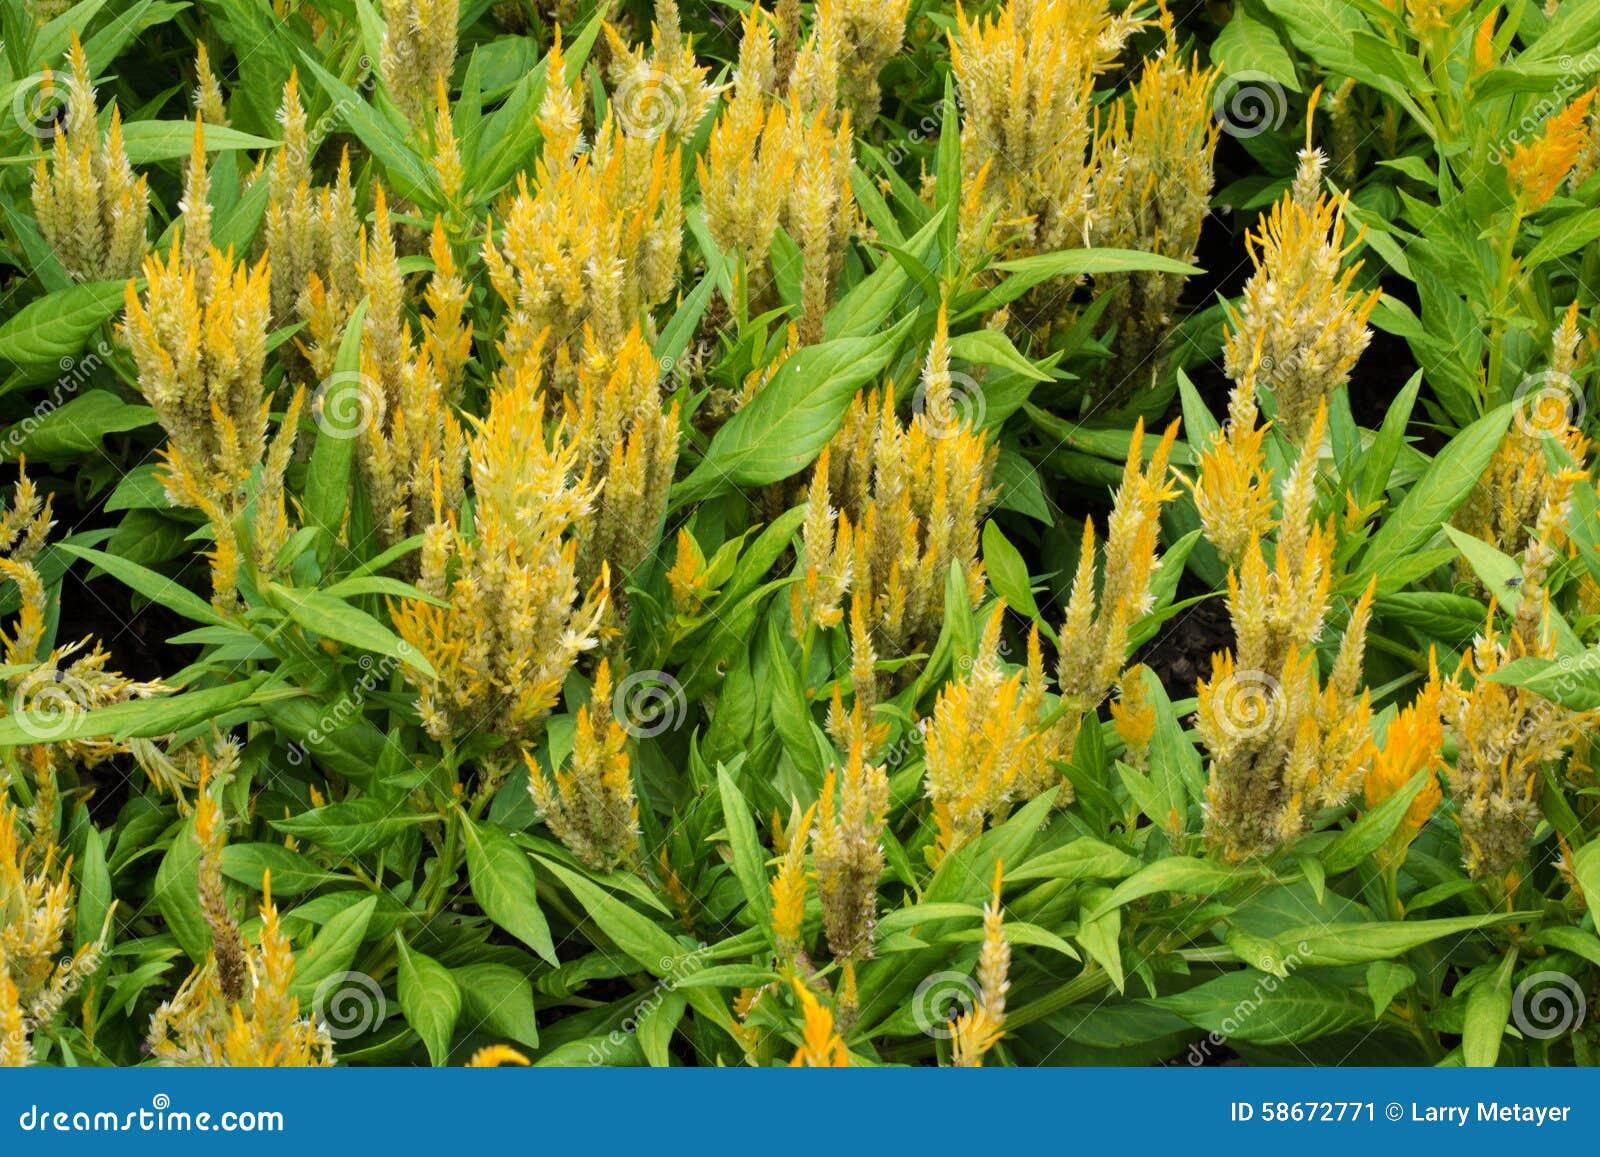 Celosia cristata flowers in bloom stock image image of closeup download comp izmirmasajfo